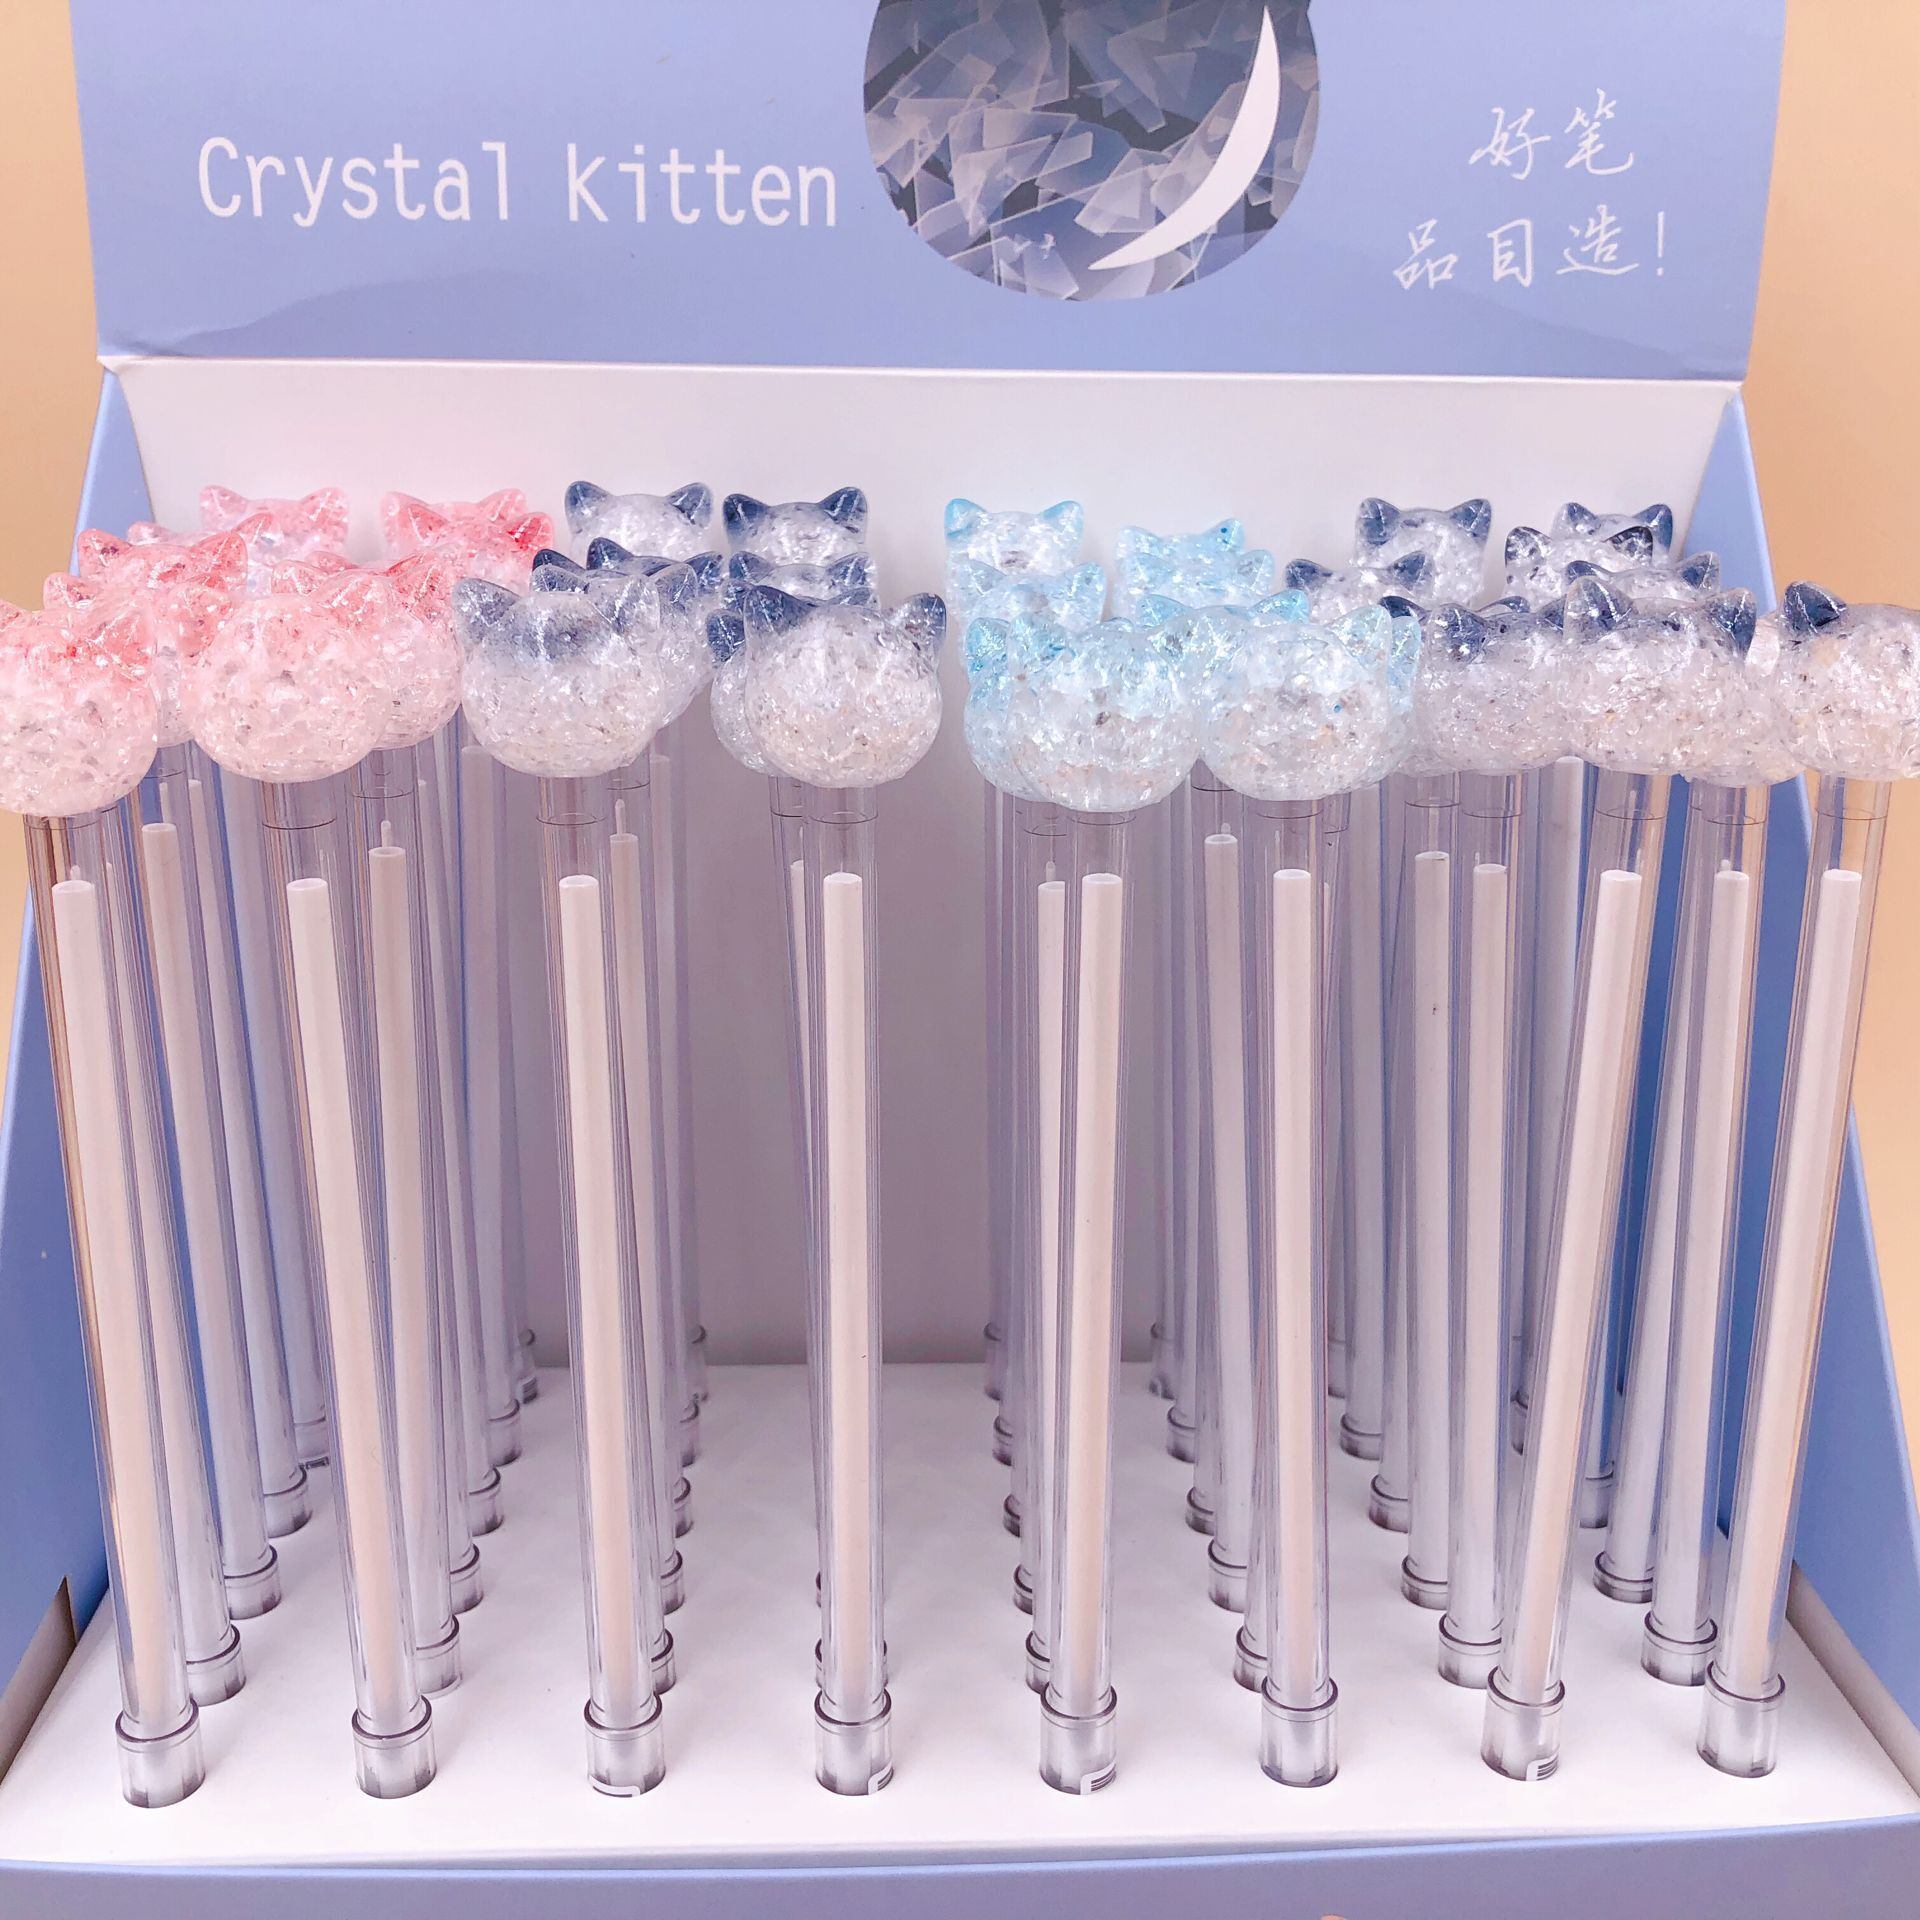 48pcs lot cute cartoon Crystal cat candy color animal gel pen Korea creative water ink pen